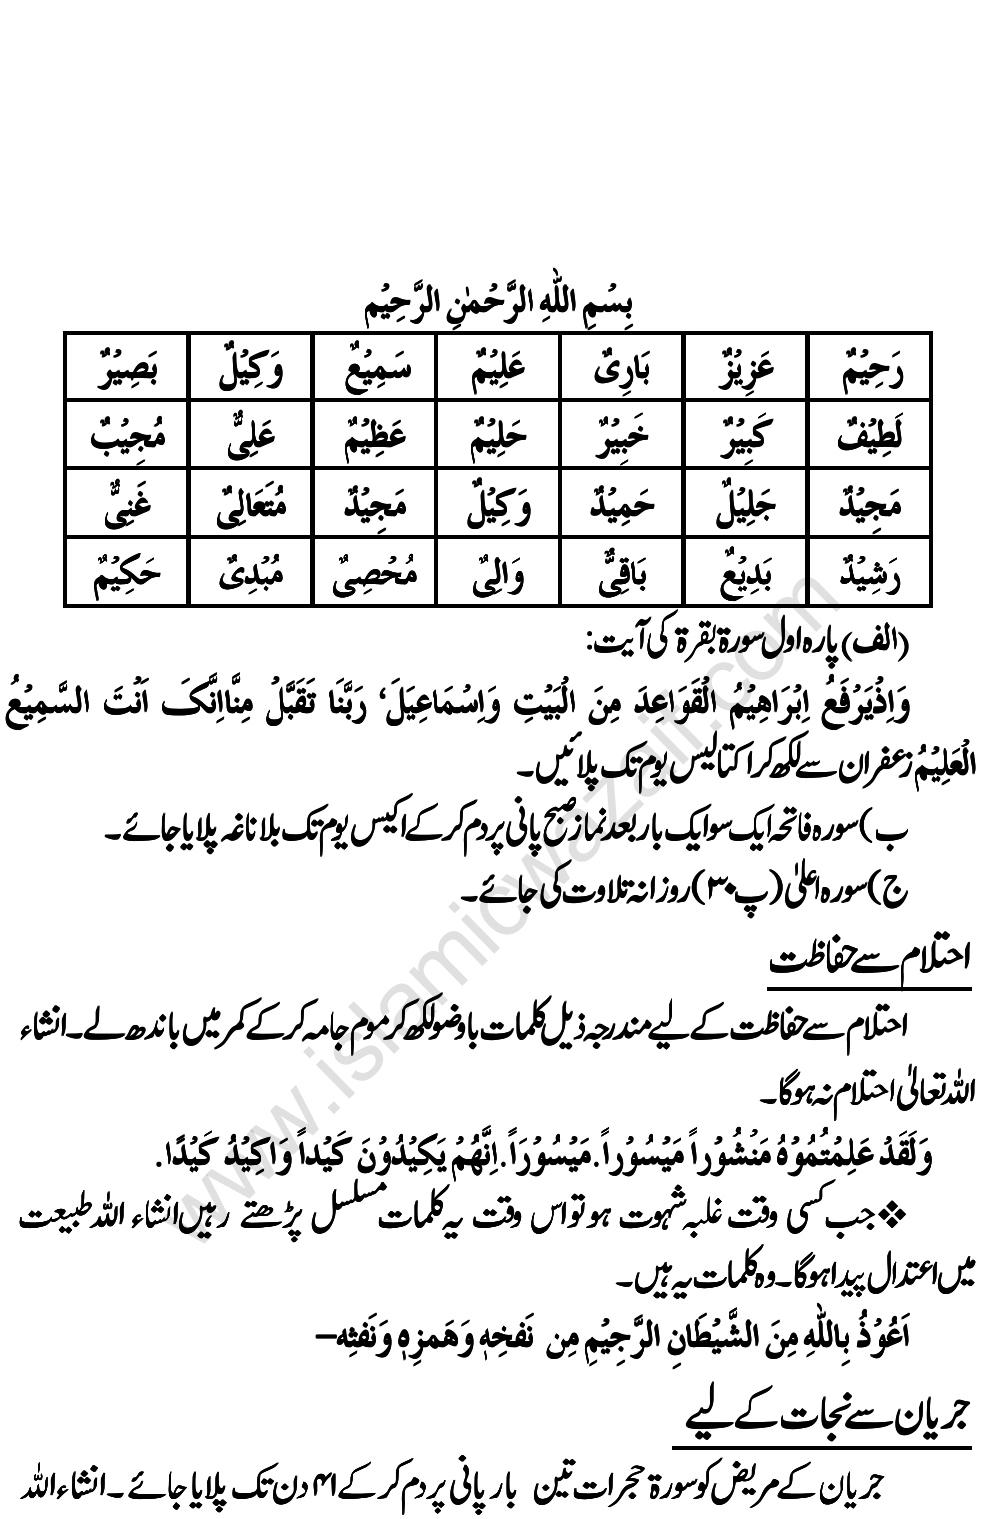 Powerful Wazifa For Height In Urdu